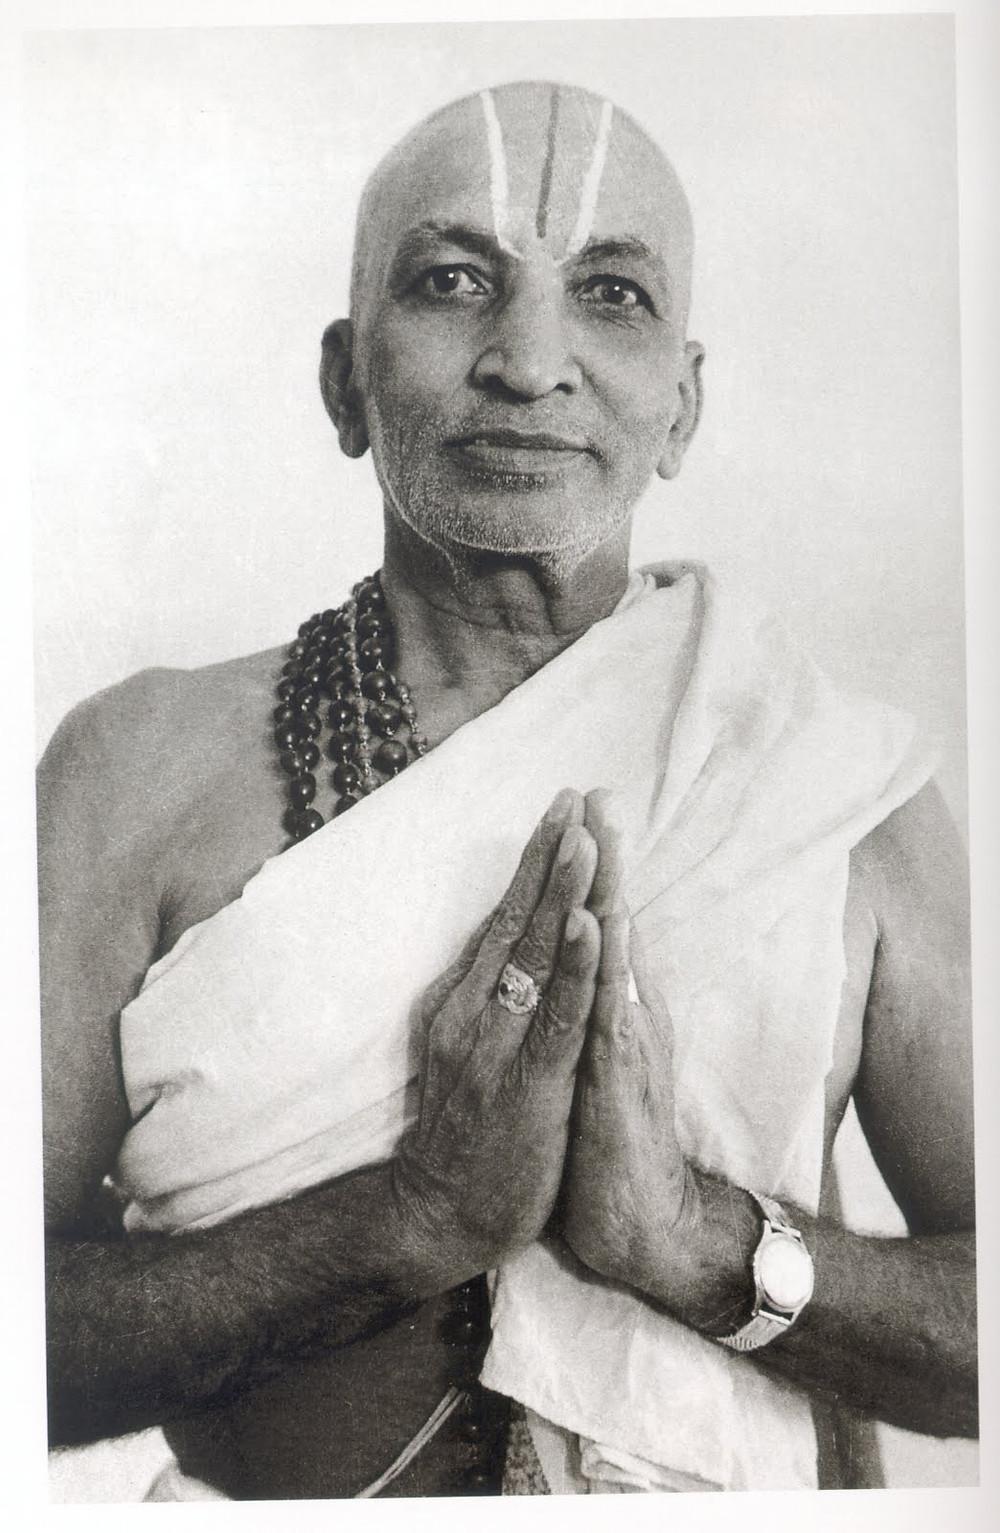 Krishnamacharya, father of modern yoga